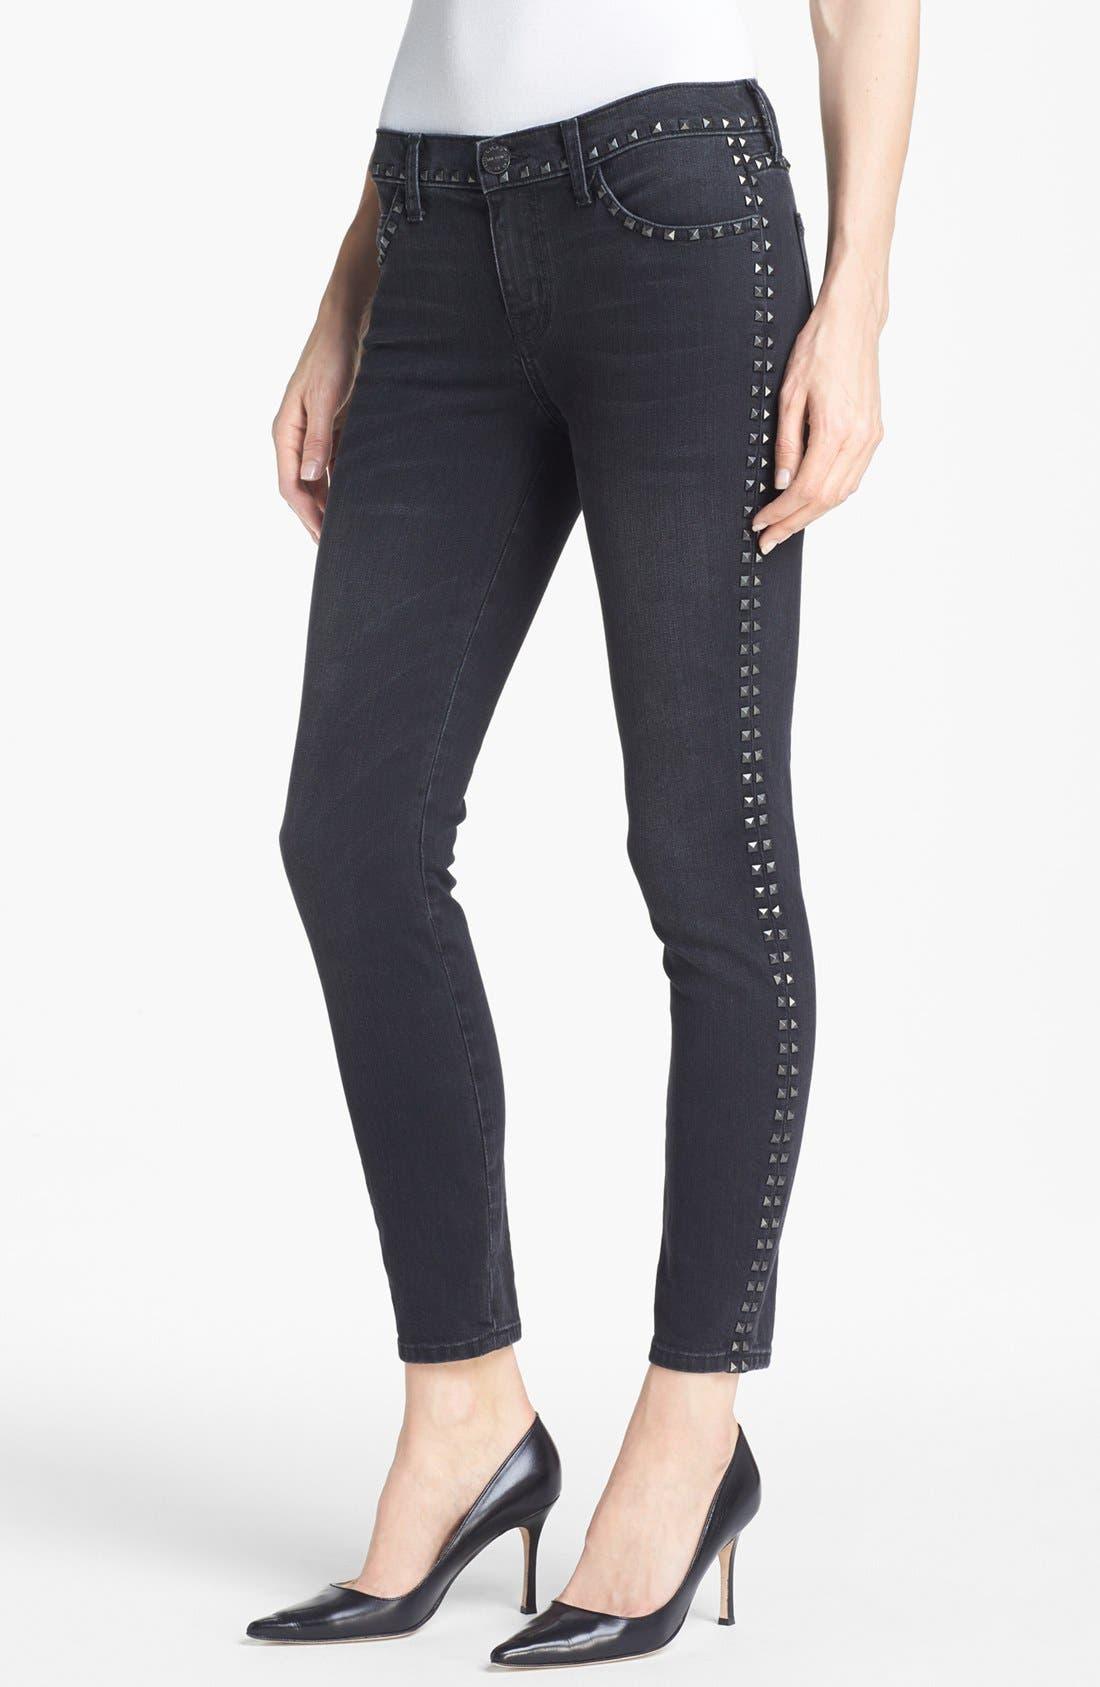 Alternate Image 1 Selected - Current/Elliott 'The Crop Skinny' Studded Jeans